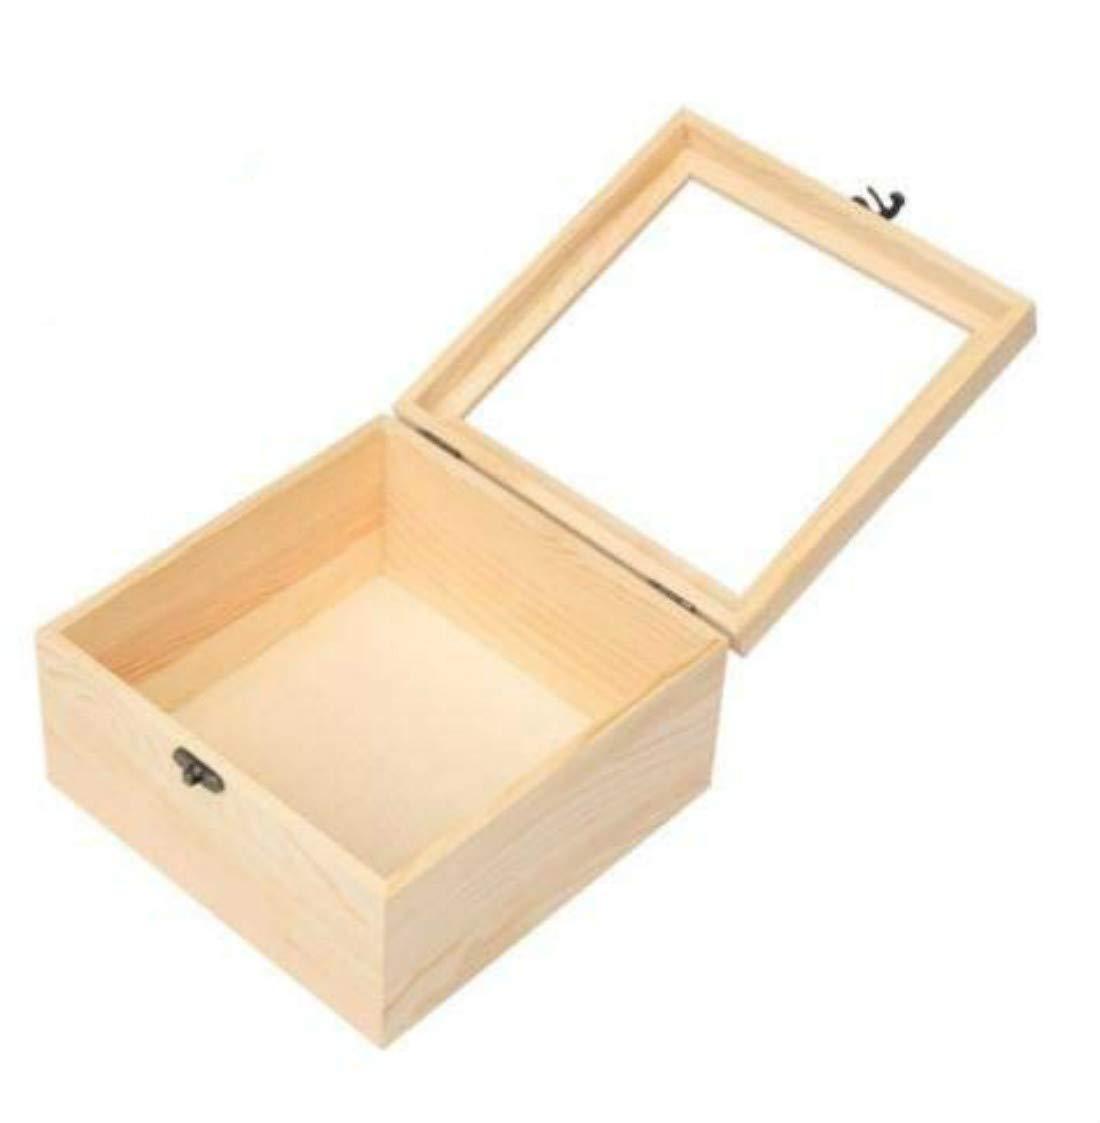 Fdit Caja Madera de Anillo Almacenamiento Caja de Joyas Caja de Almacenamiento con Tapa Cristal para Cosmeticos Maletín Ataúd DIY 12 * 12cm Socialme-EU: Amazon.es: Hogar